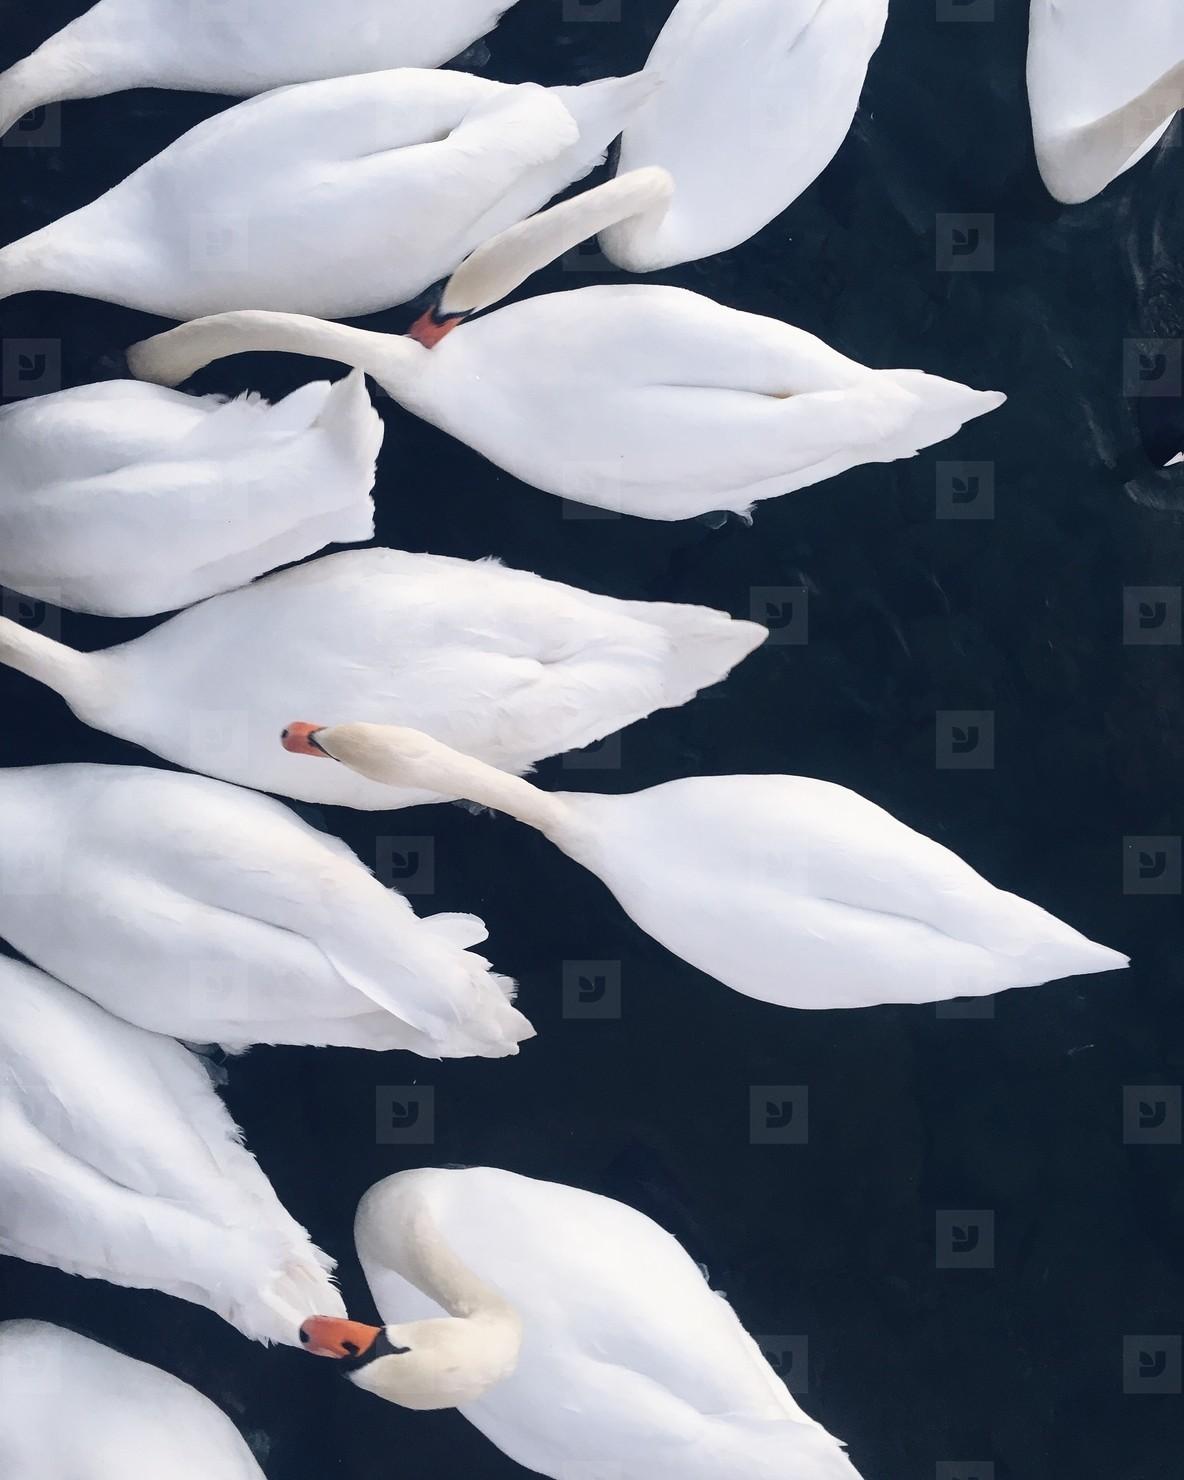 White swans